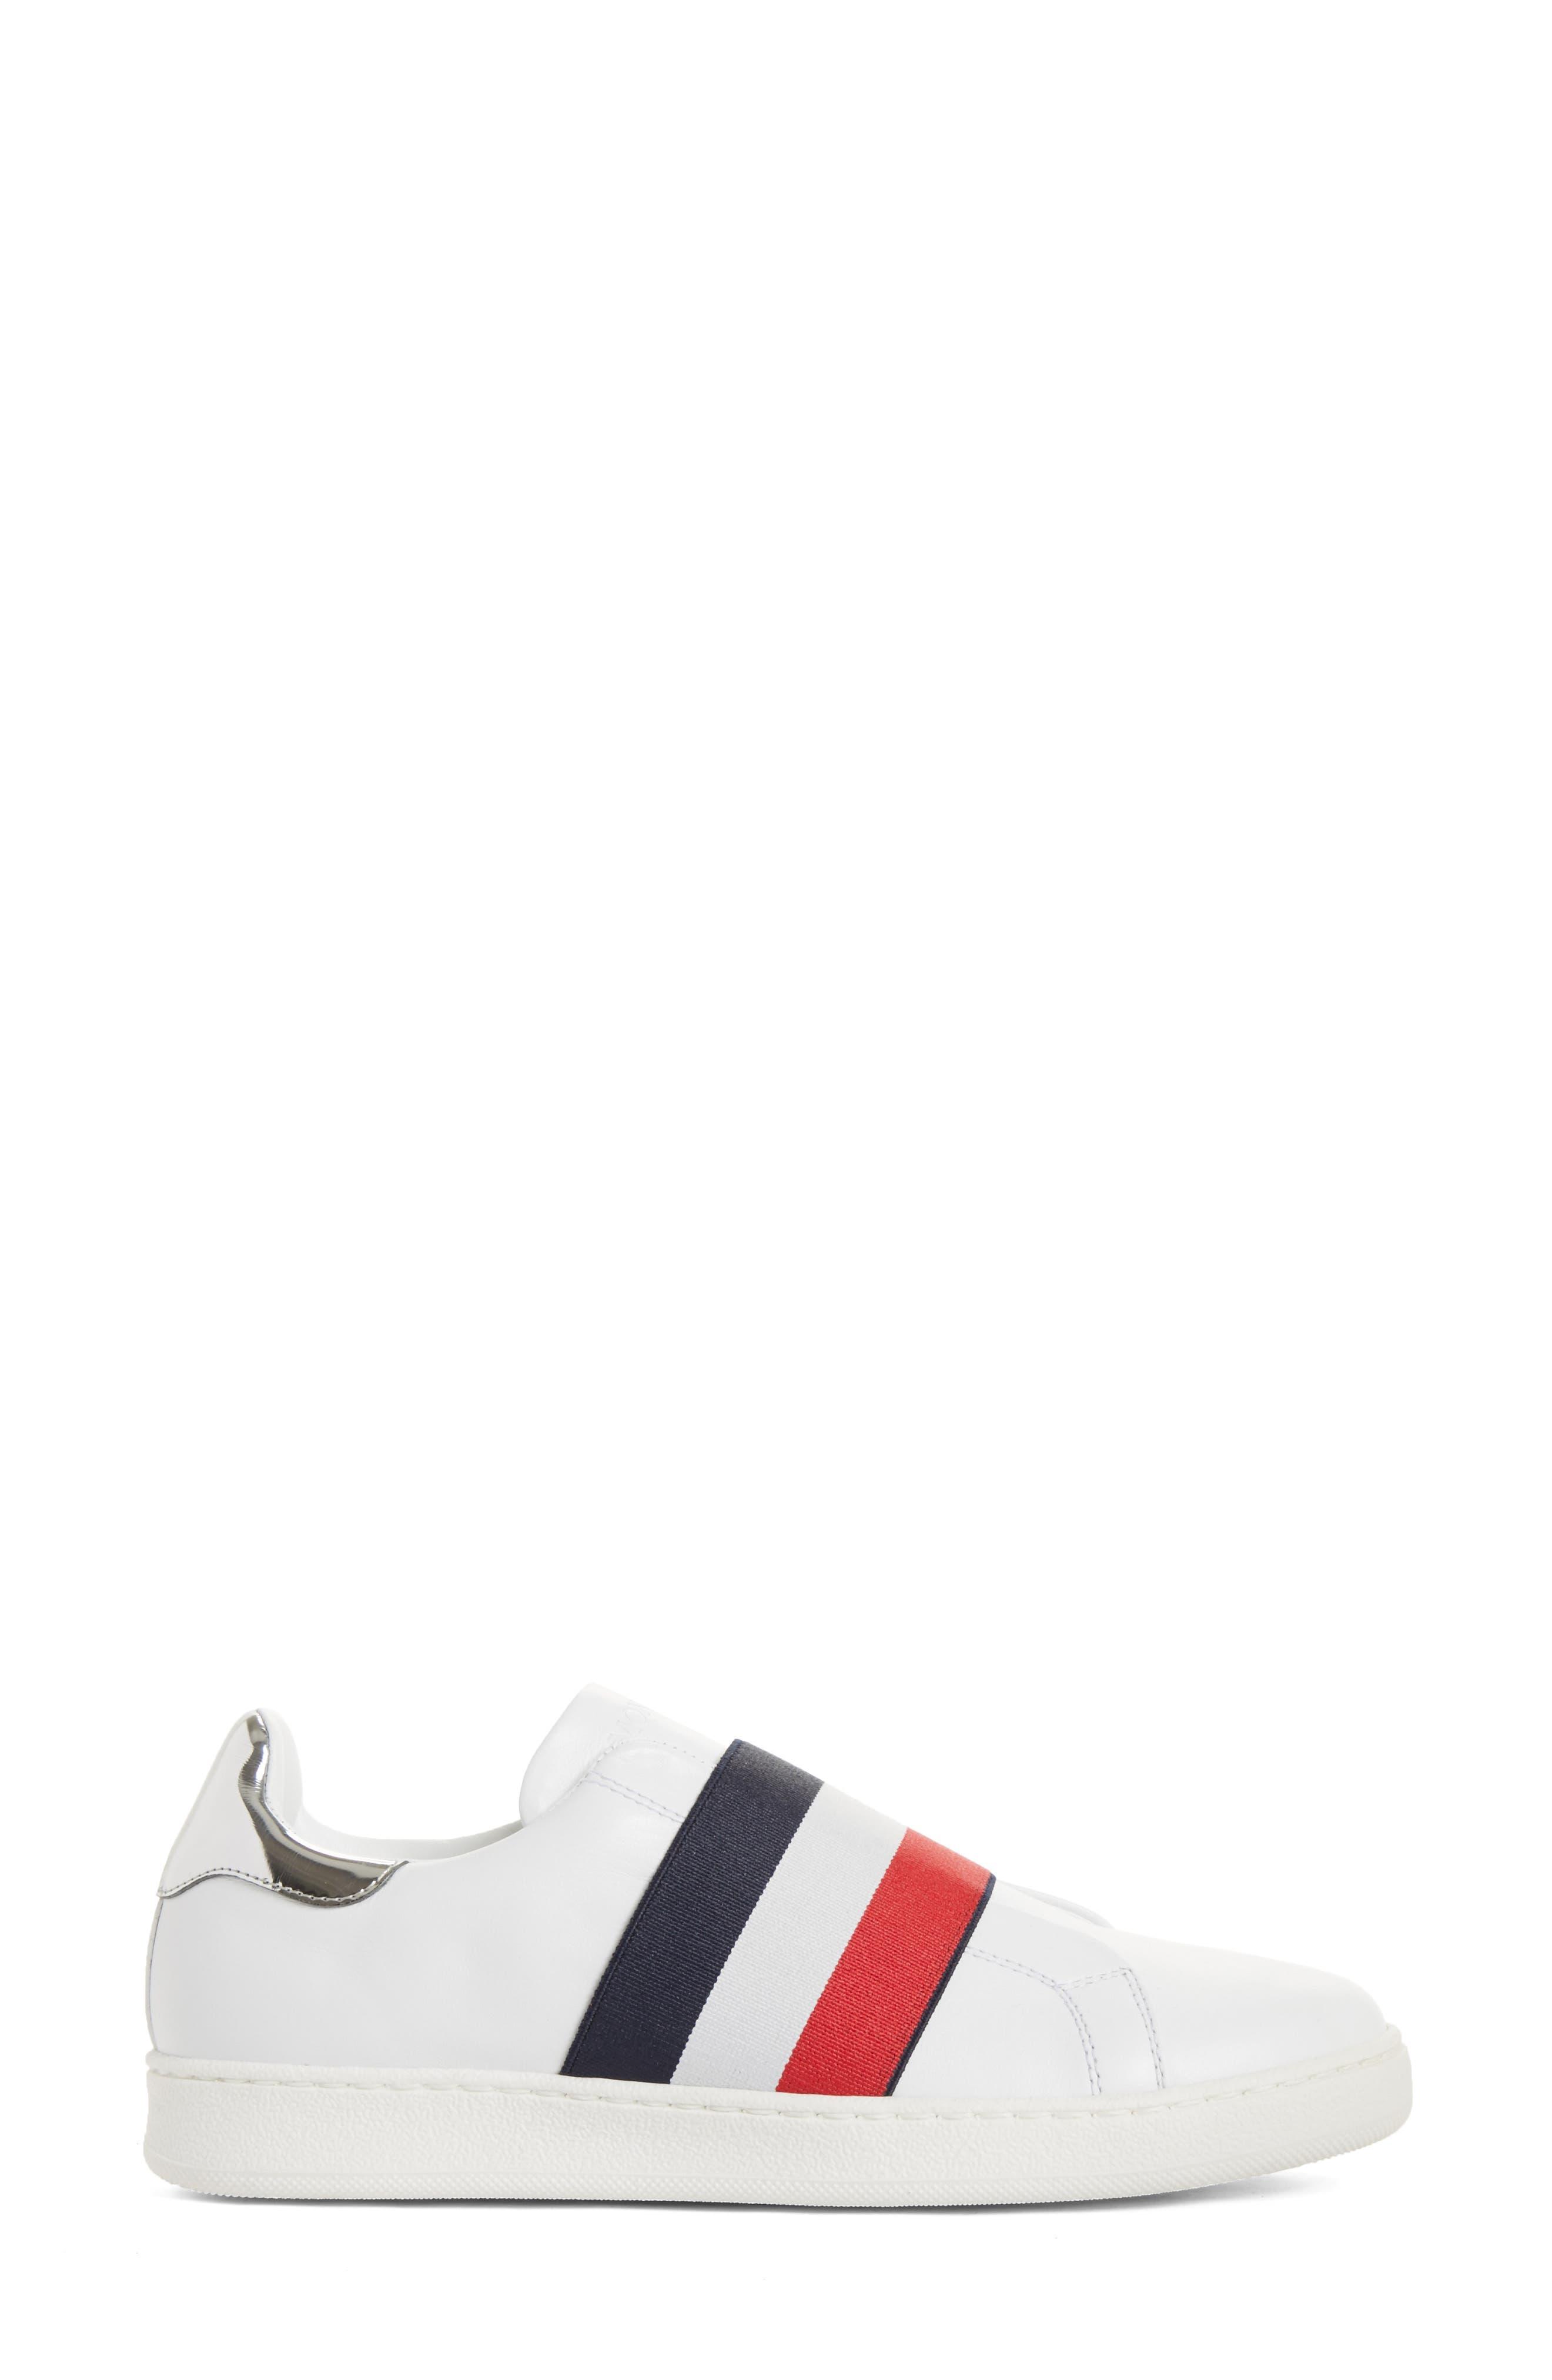 Alizee Low Top Sneaker,                             Alternate thumbnail 3, color,                             White